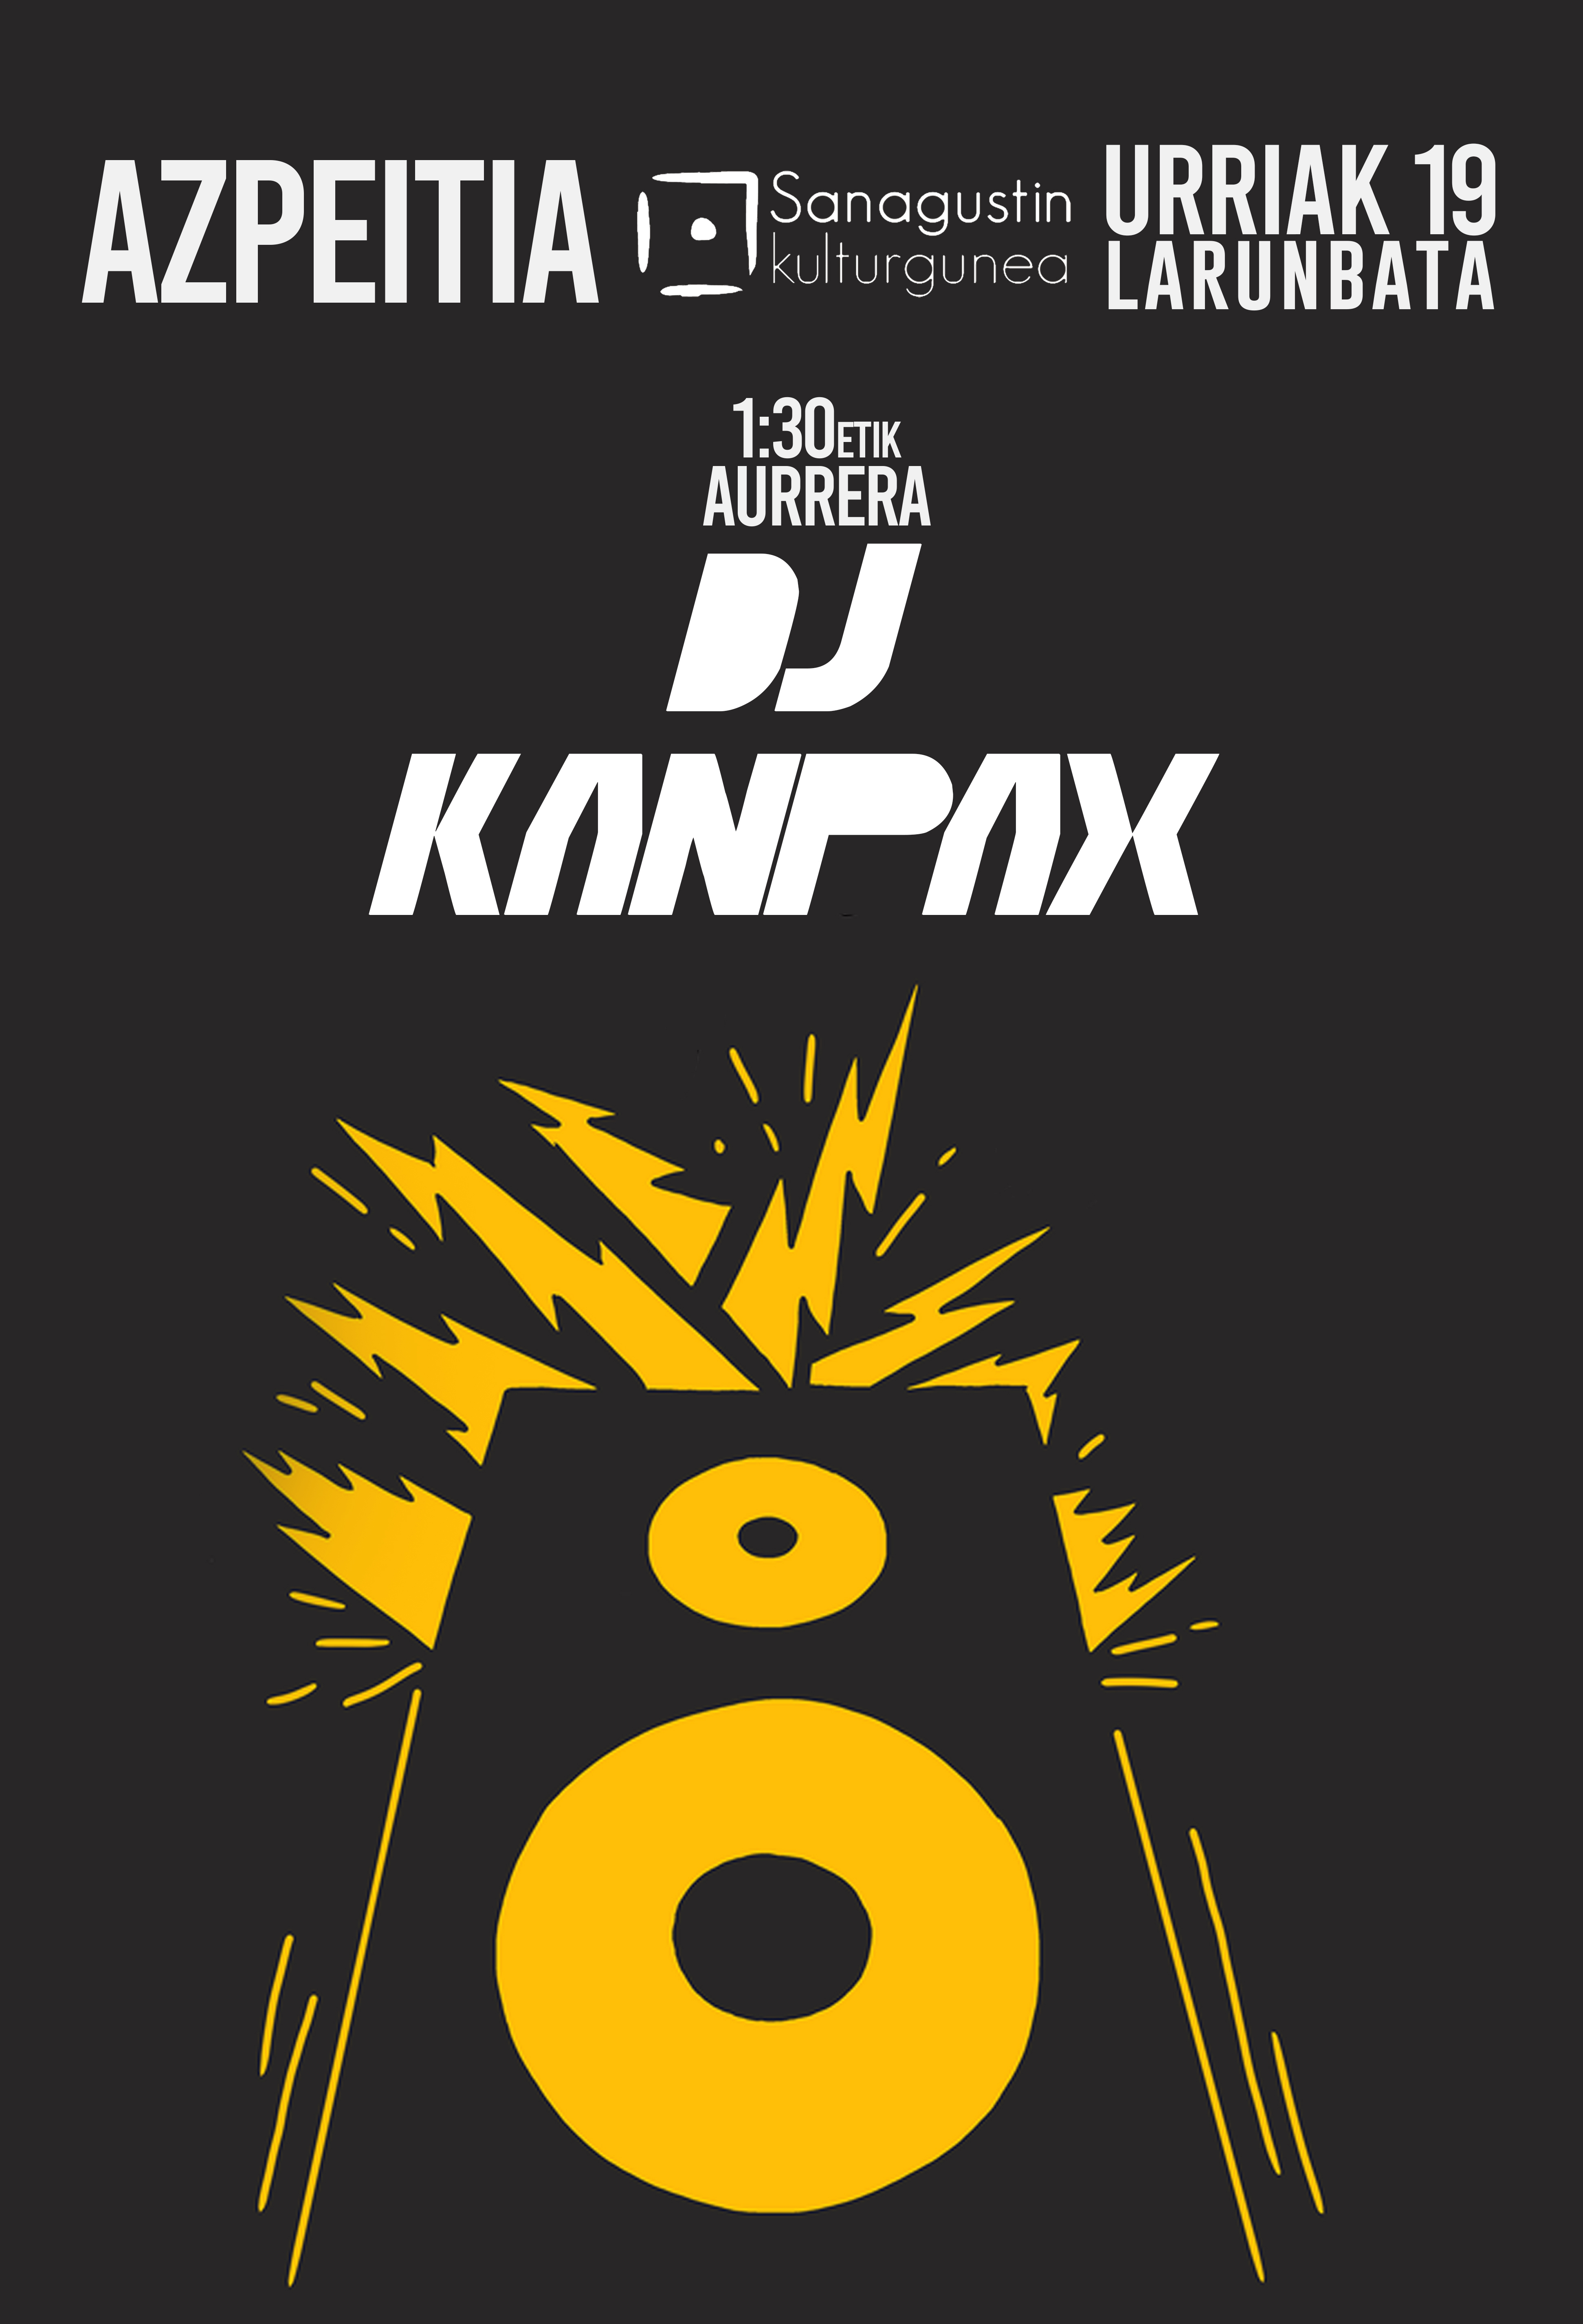 DJ Kanpax